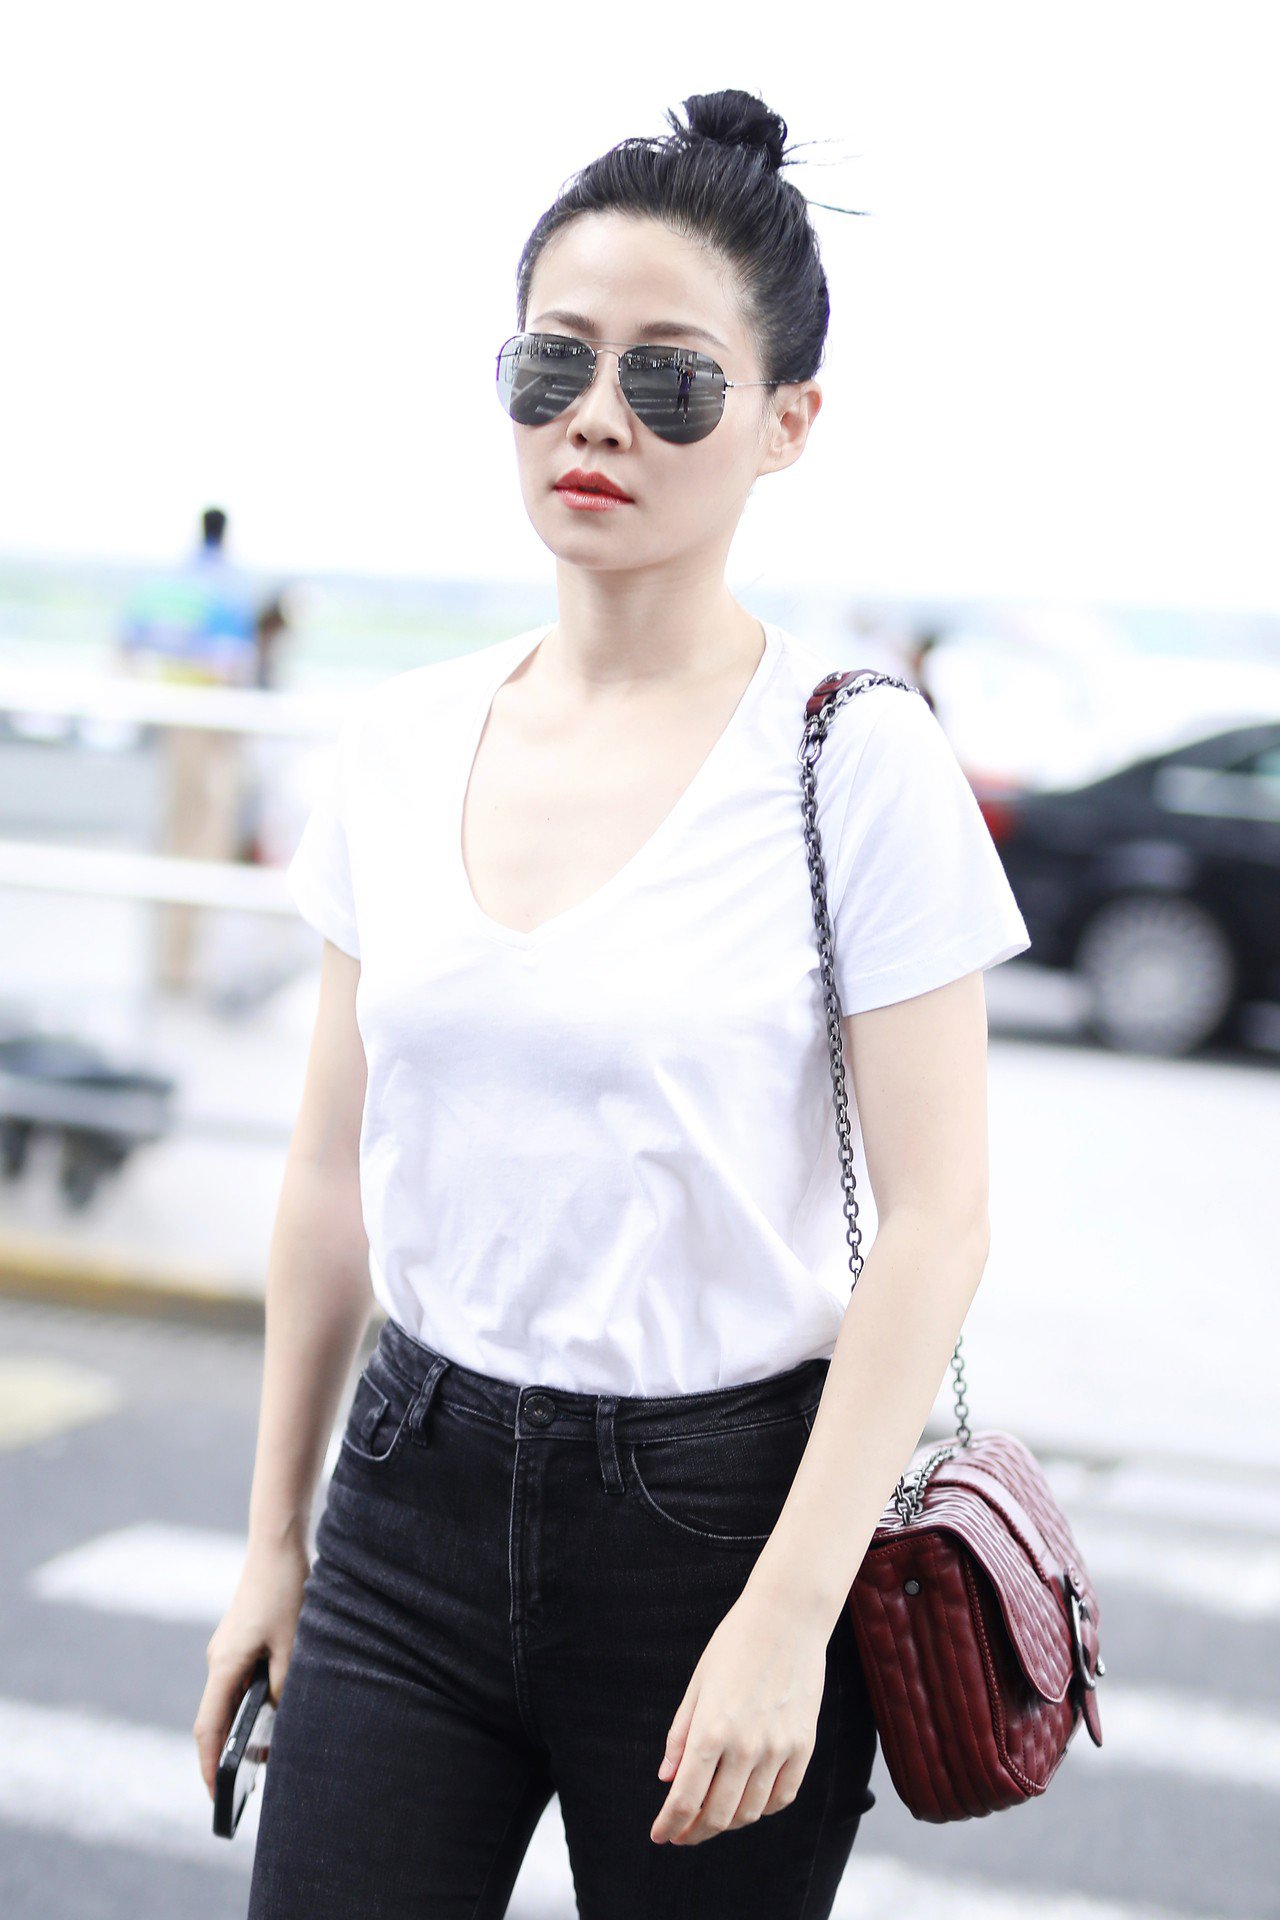 《延禧攻略》的譚卓以白T恤與黑褲搭配酒紅色Amazone Matelasse,展...